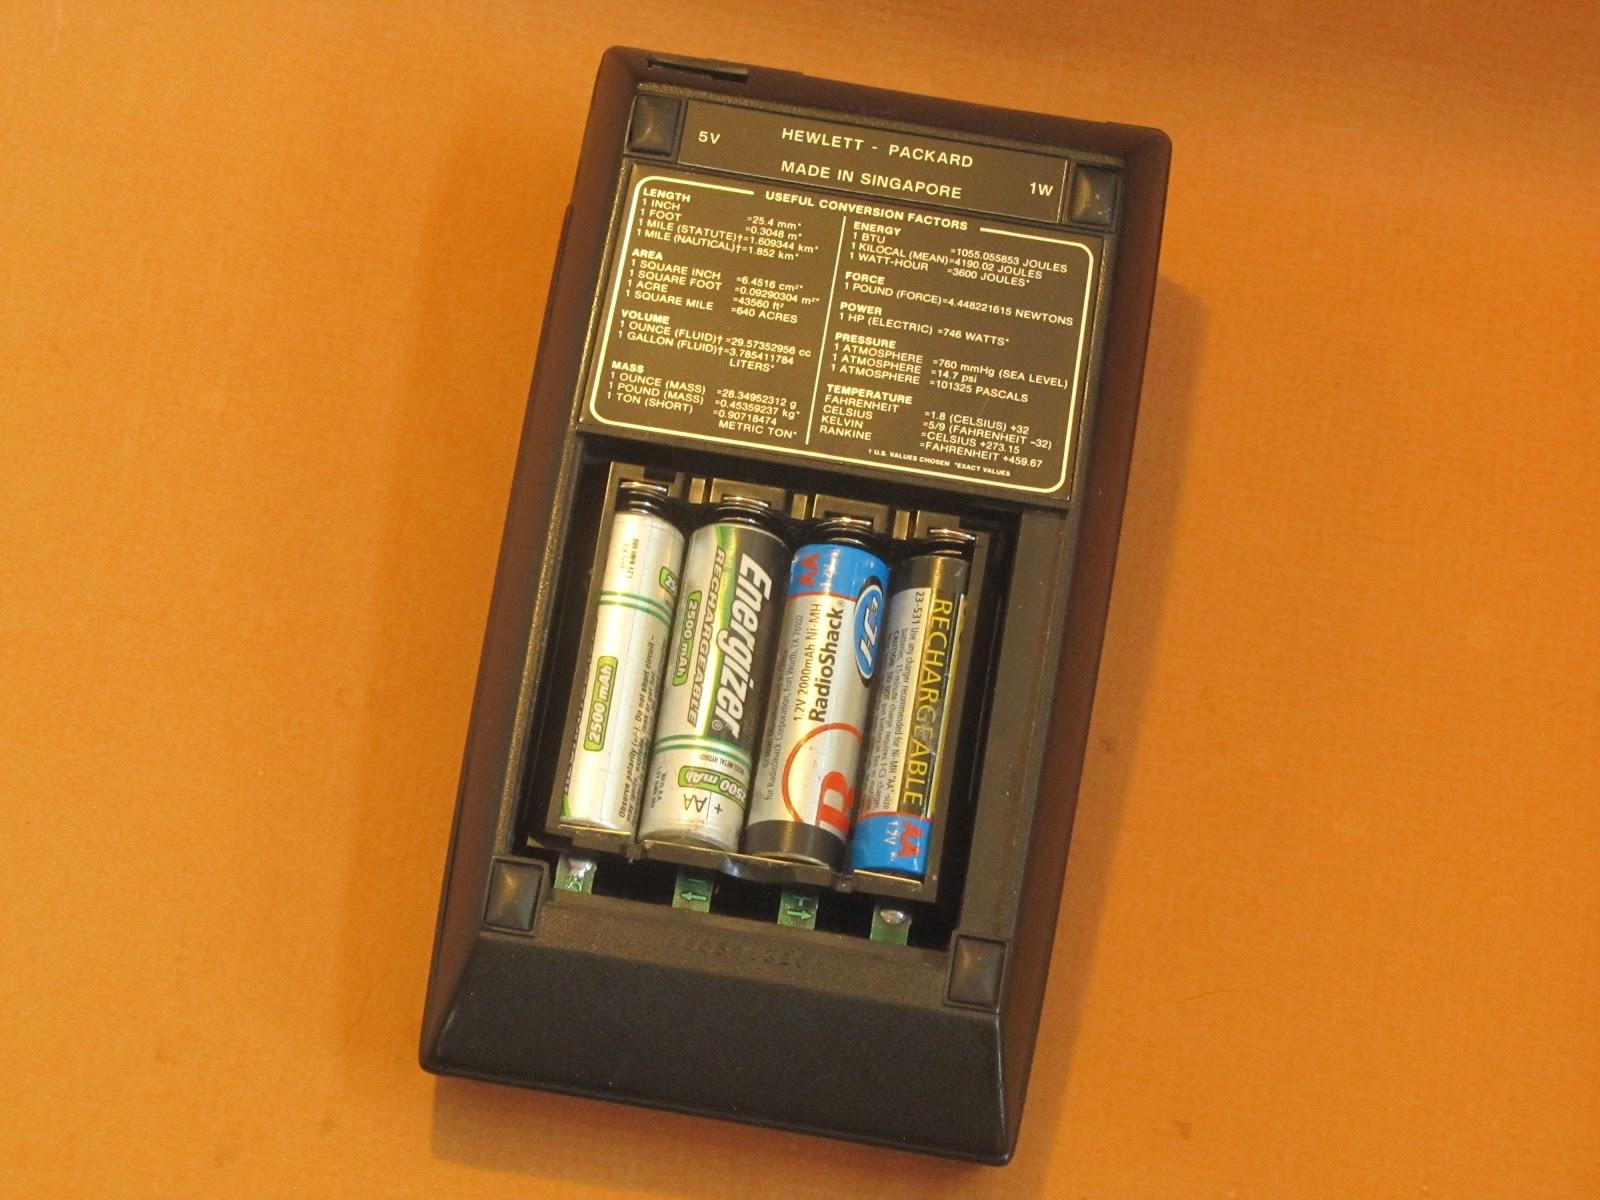 Hewlett Packard - Bob's Calculators and Slide Rules